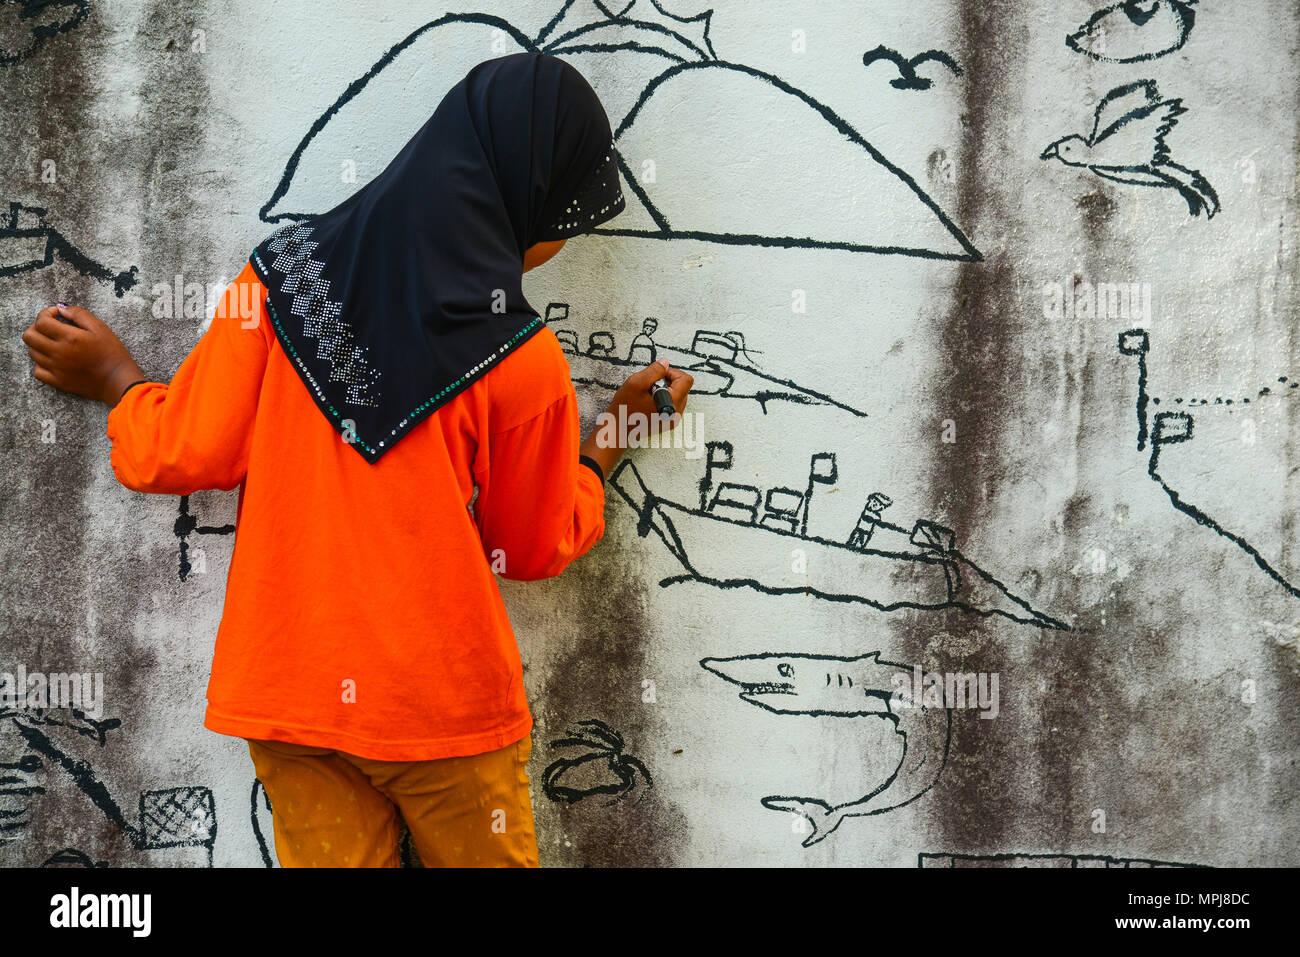 Krabi, Thailand - May 3, 2015: Muslim girl wearing black hijab drawing graphic image on wall of ruined house in Krabi, Thailand Stock Photo